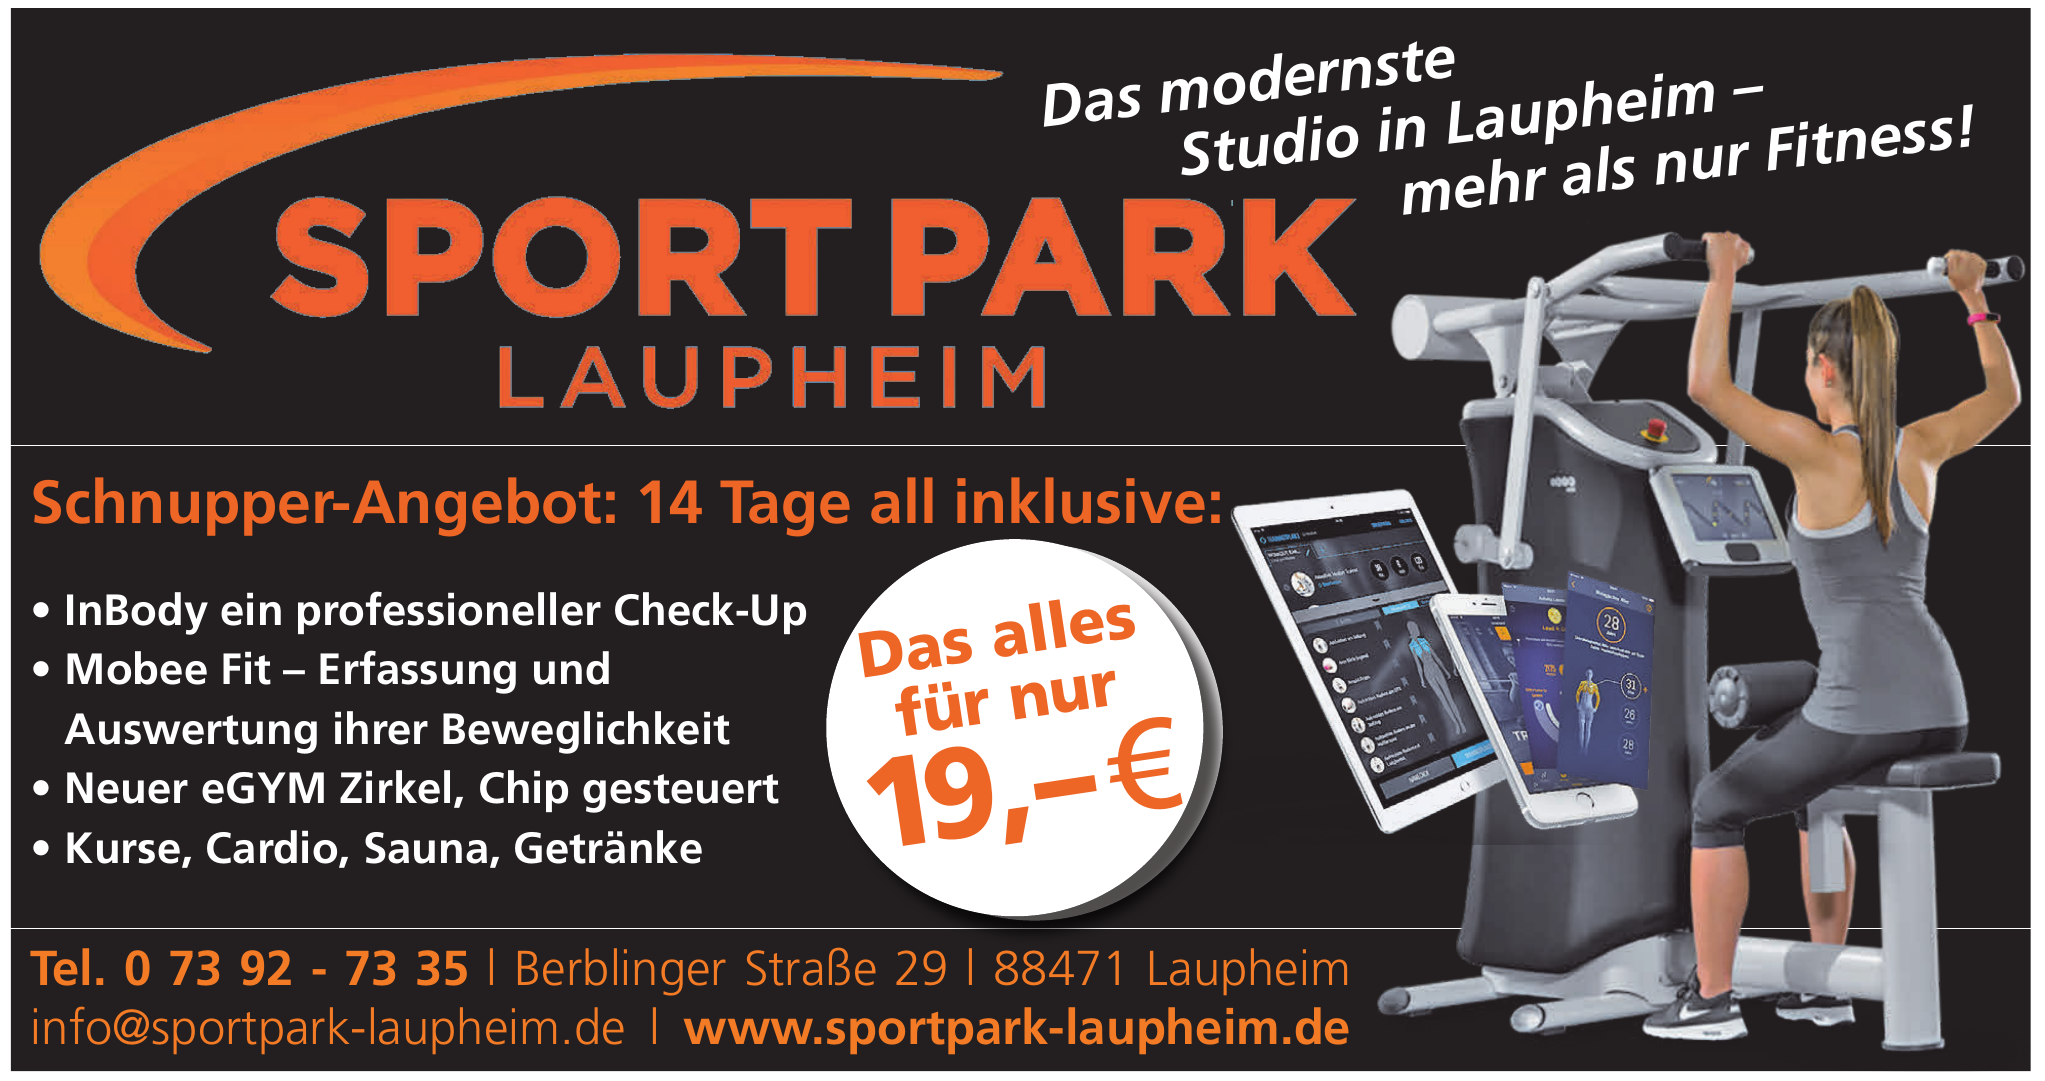 Sportpark Laupheim